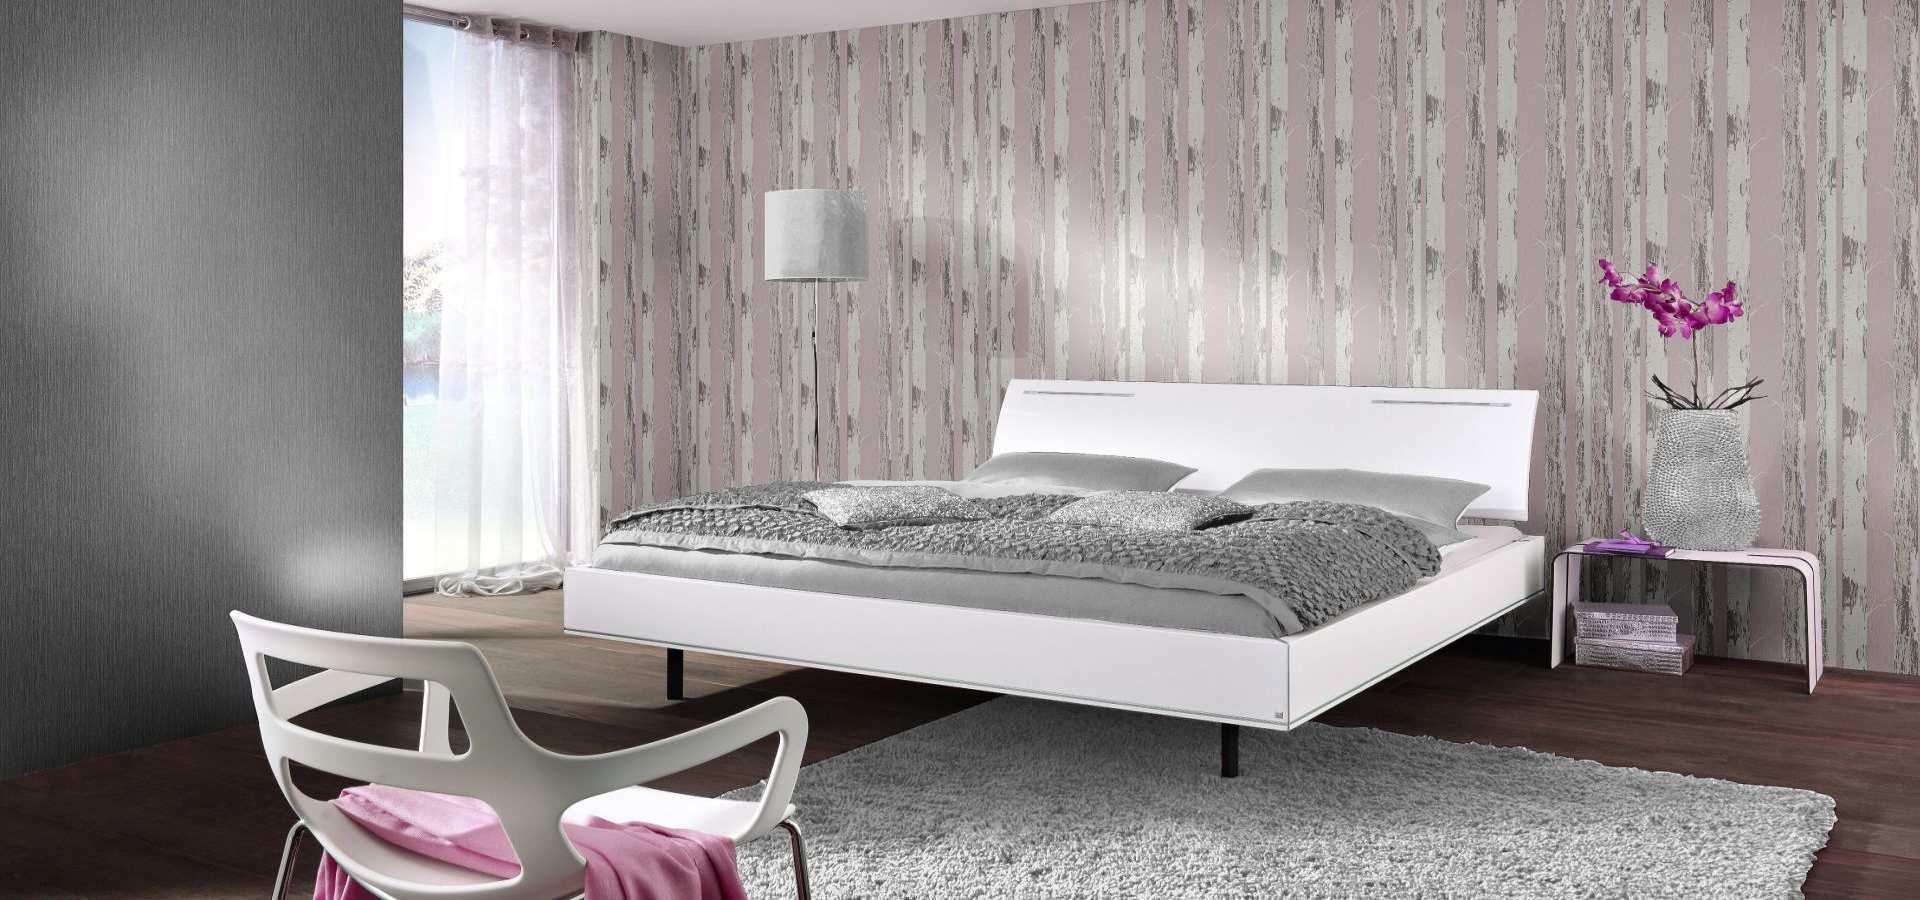 Schlafzimmer Tapete rosa silber